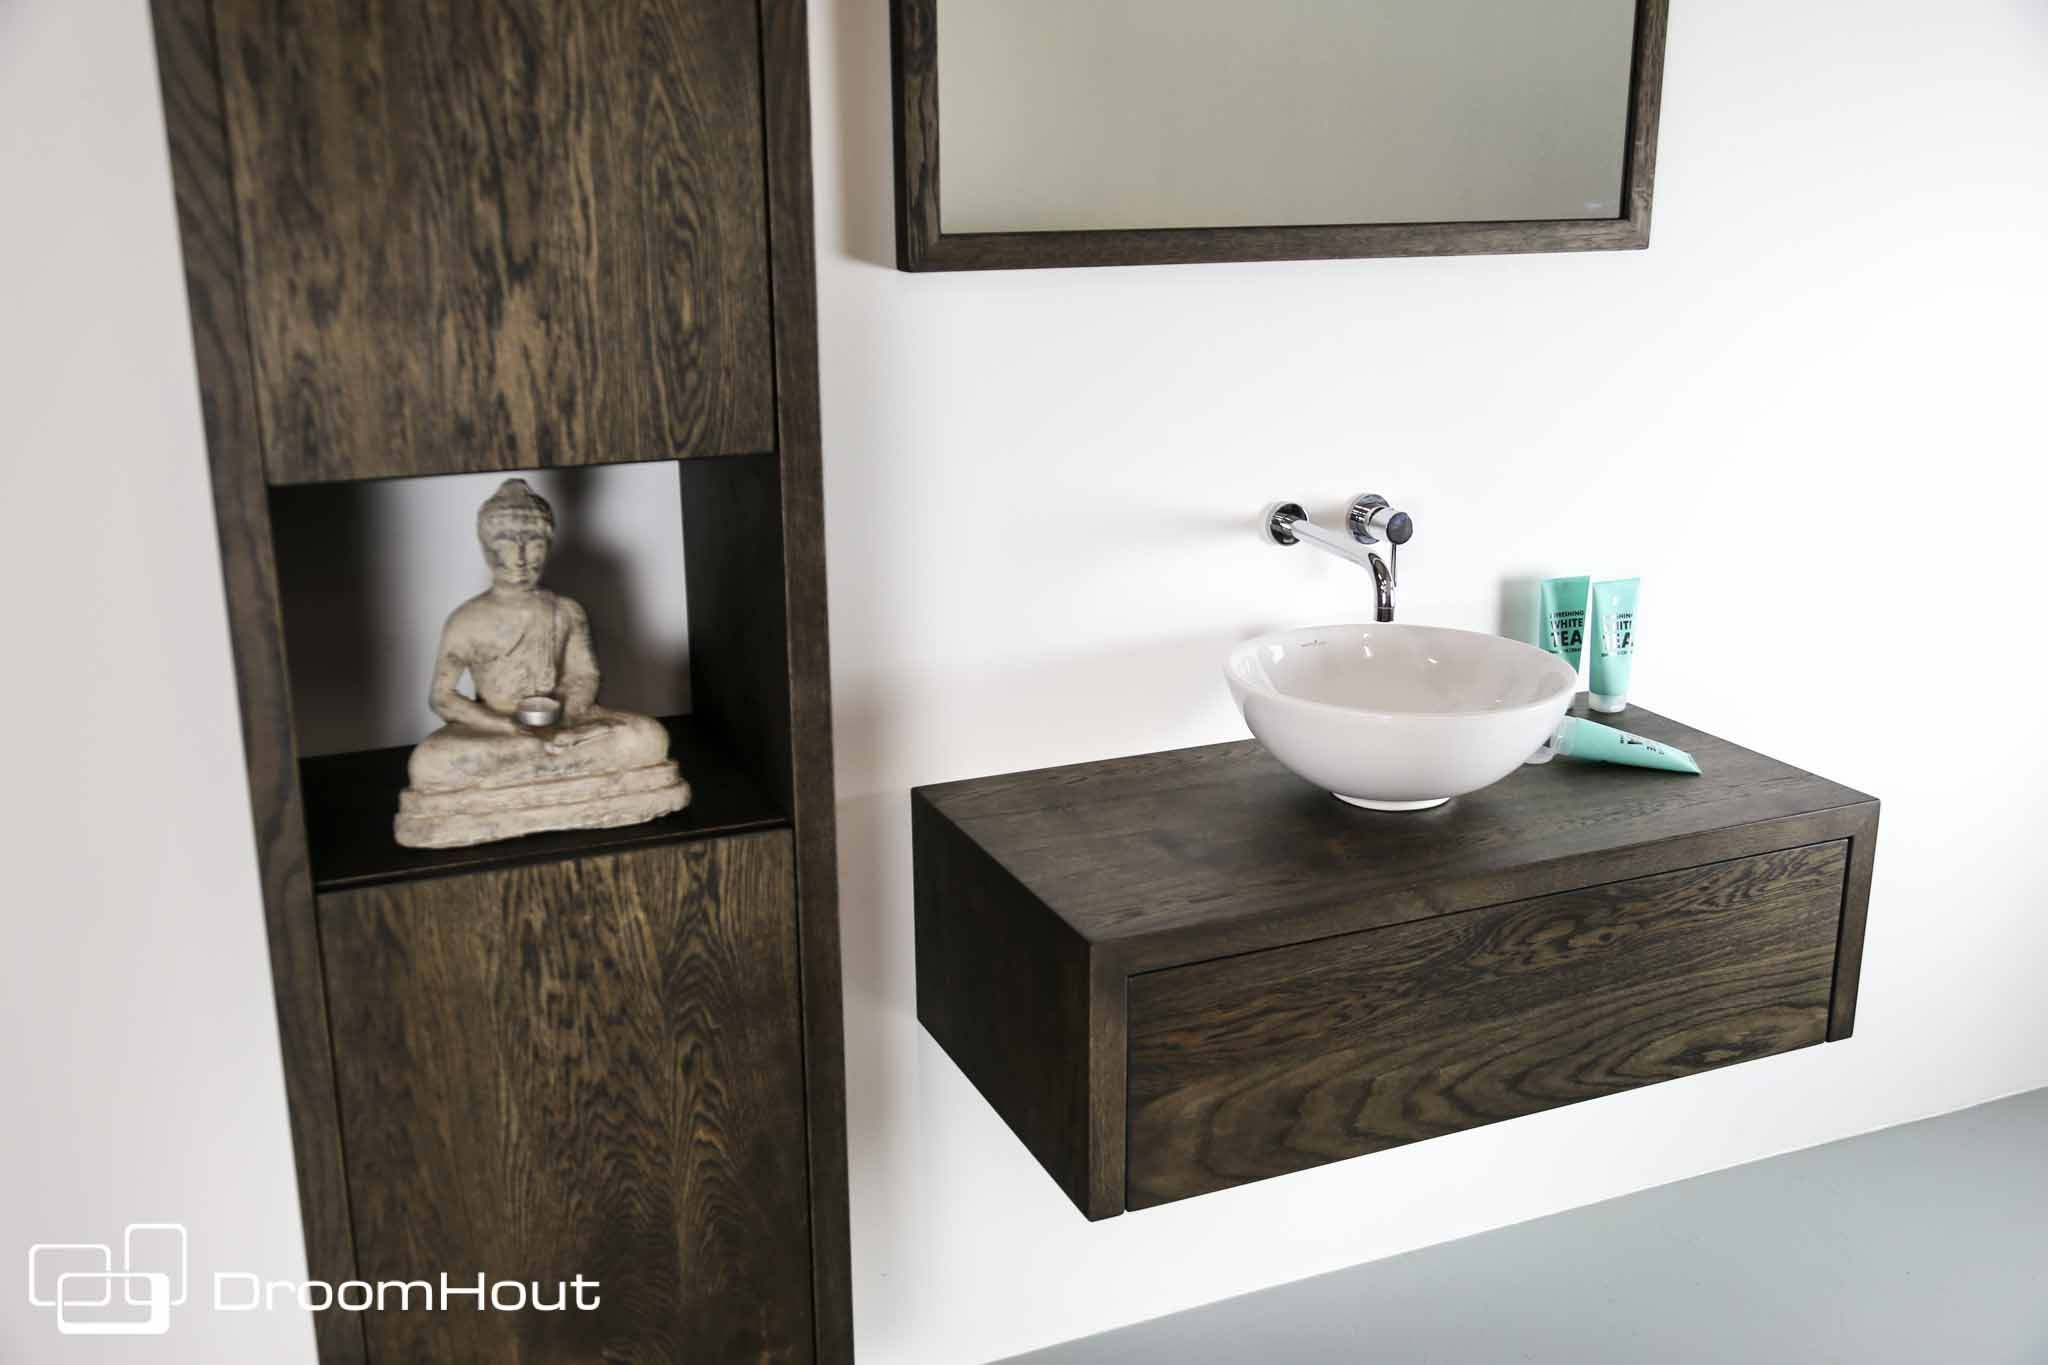 Badkamermeubel Met Badkamerkast : Badkamermeubel badkamerkast eikenhout spa wonen en design